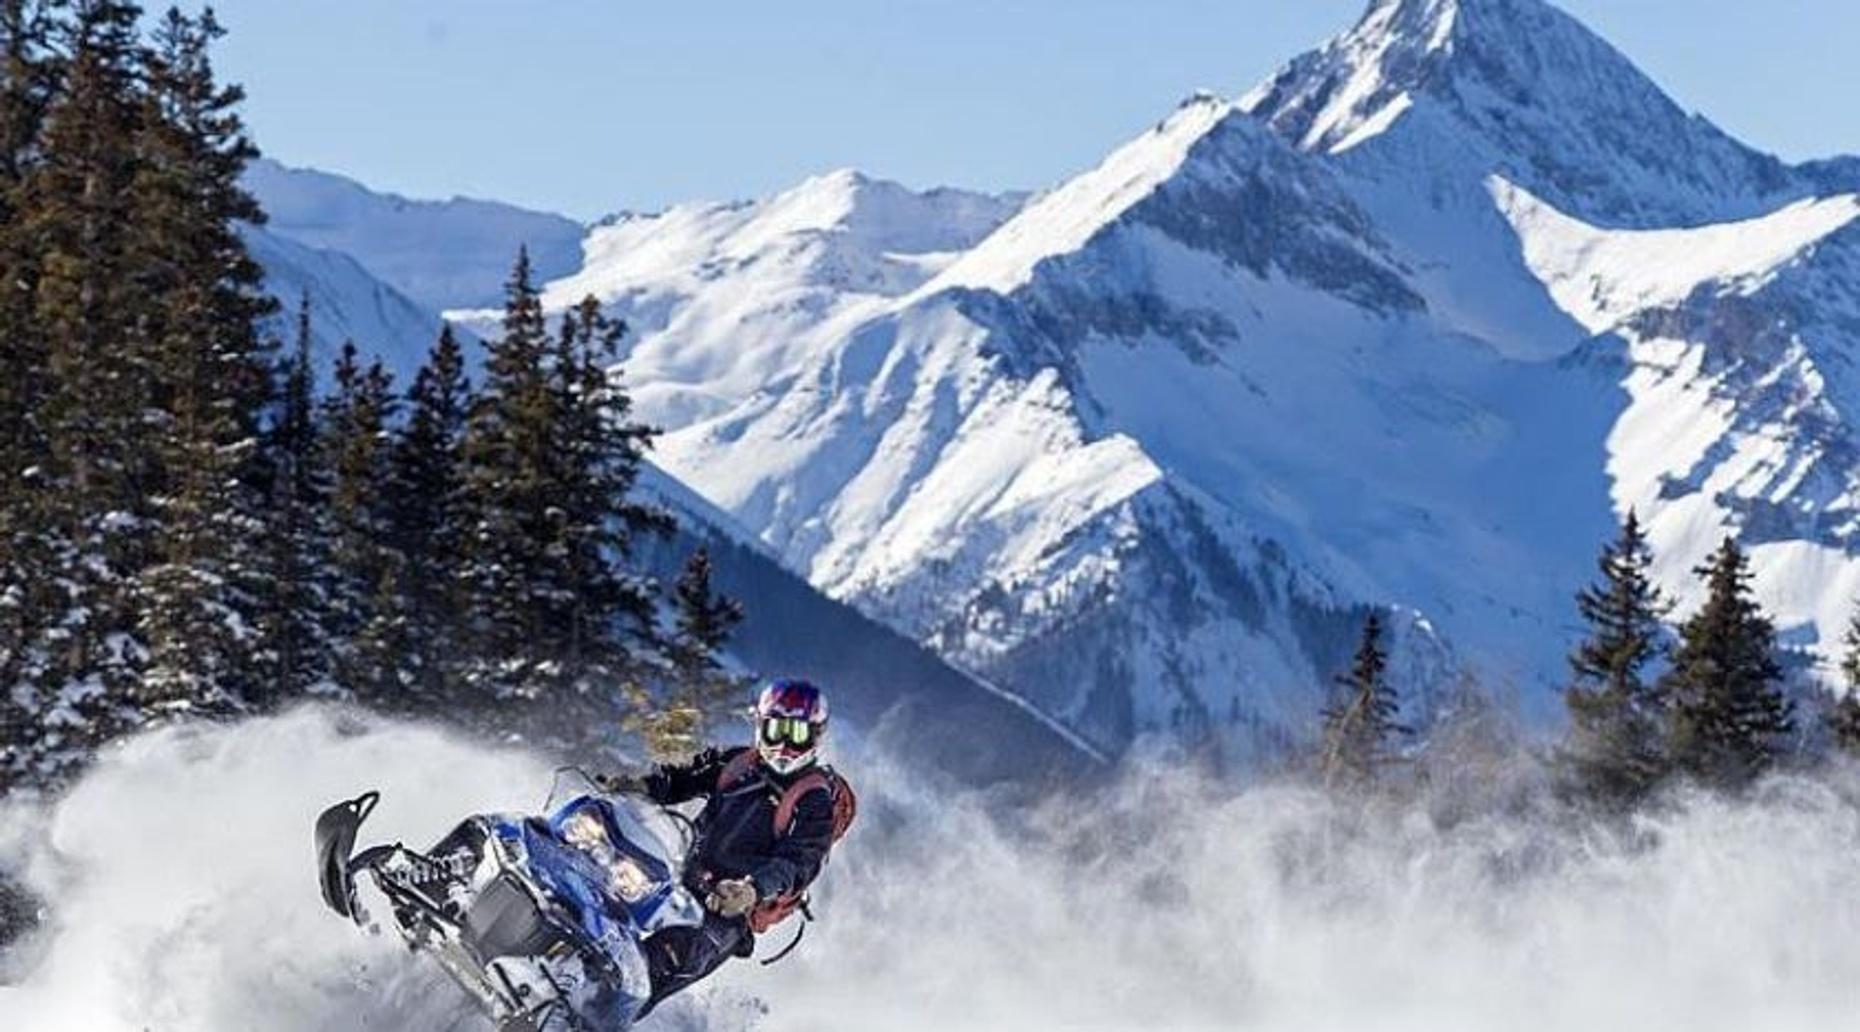 2-Hour Snowmobile Tour